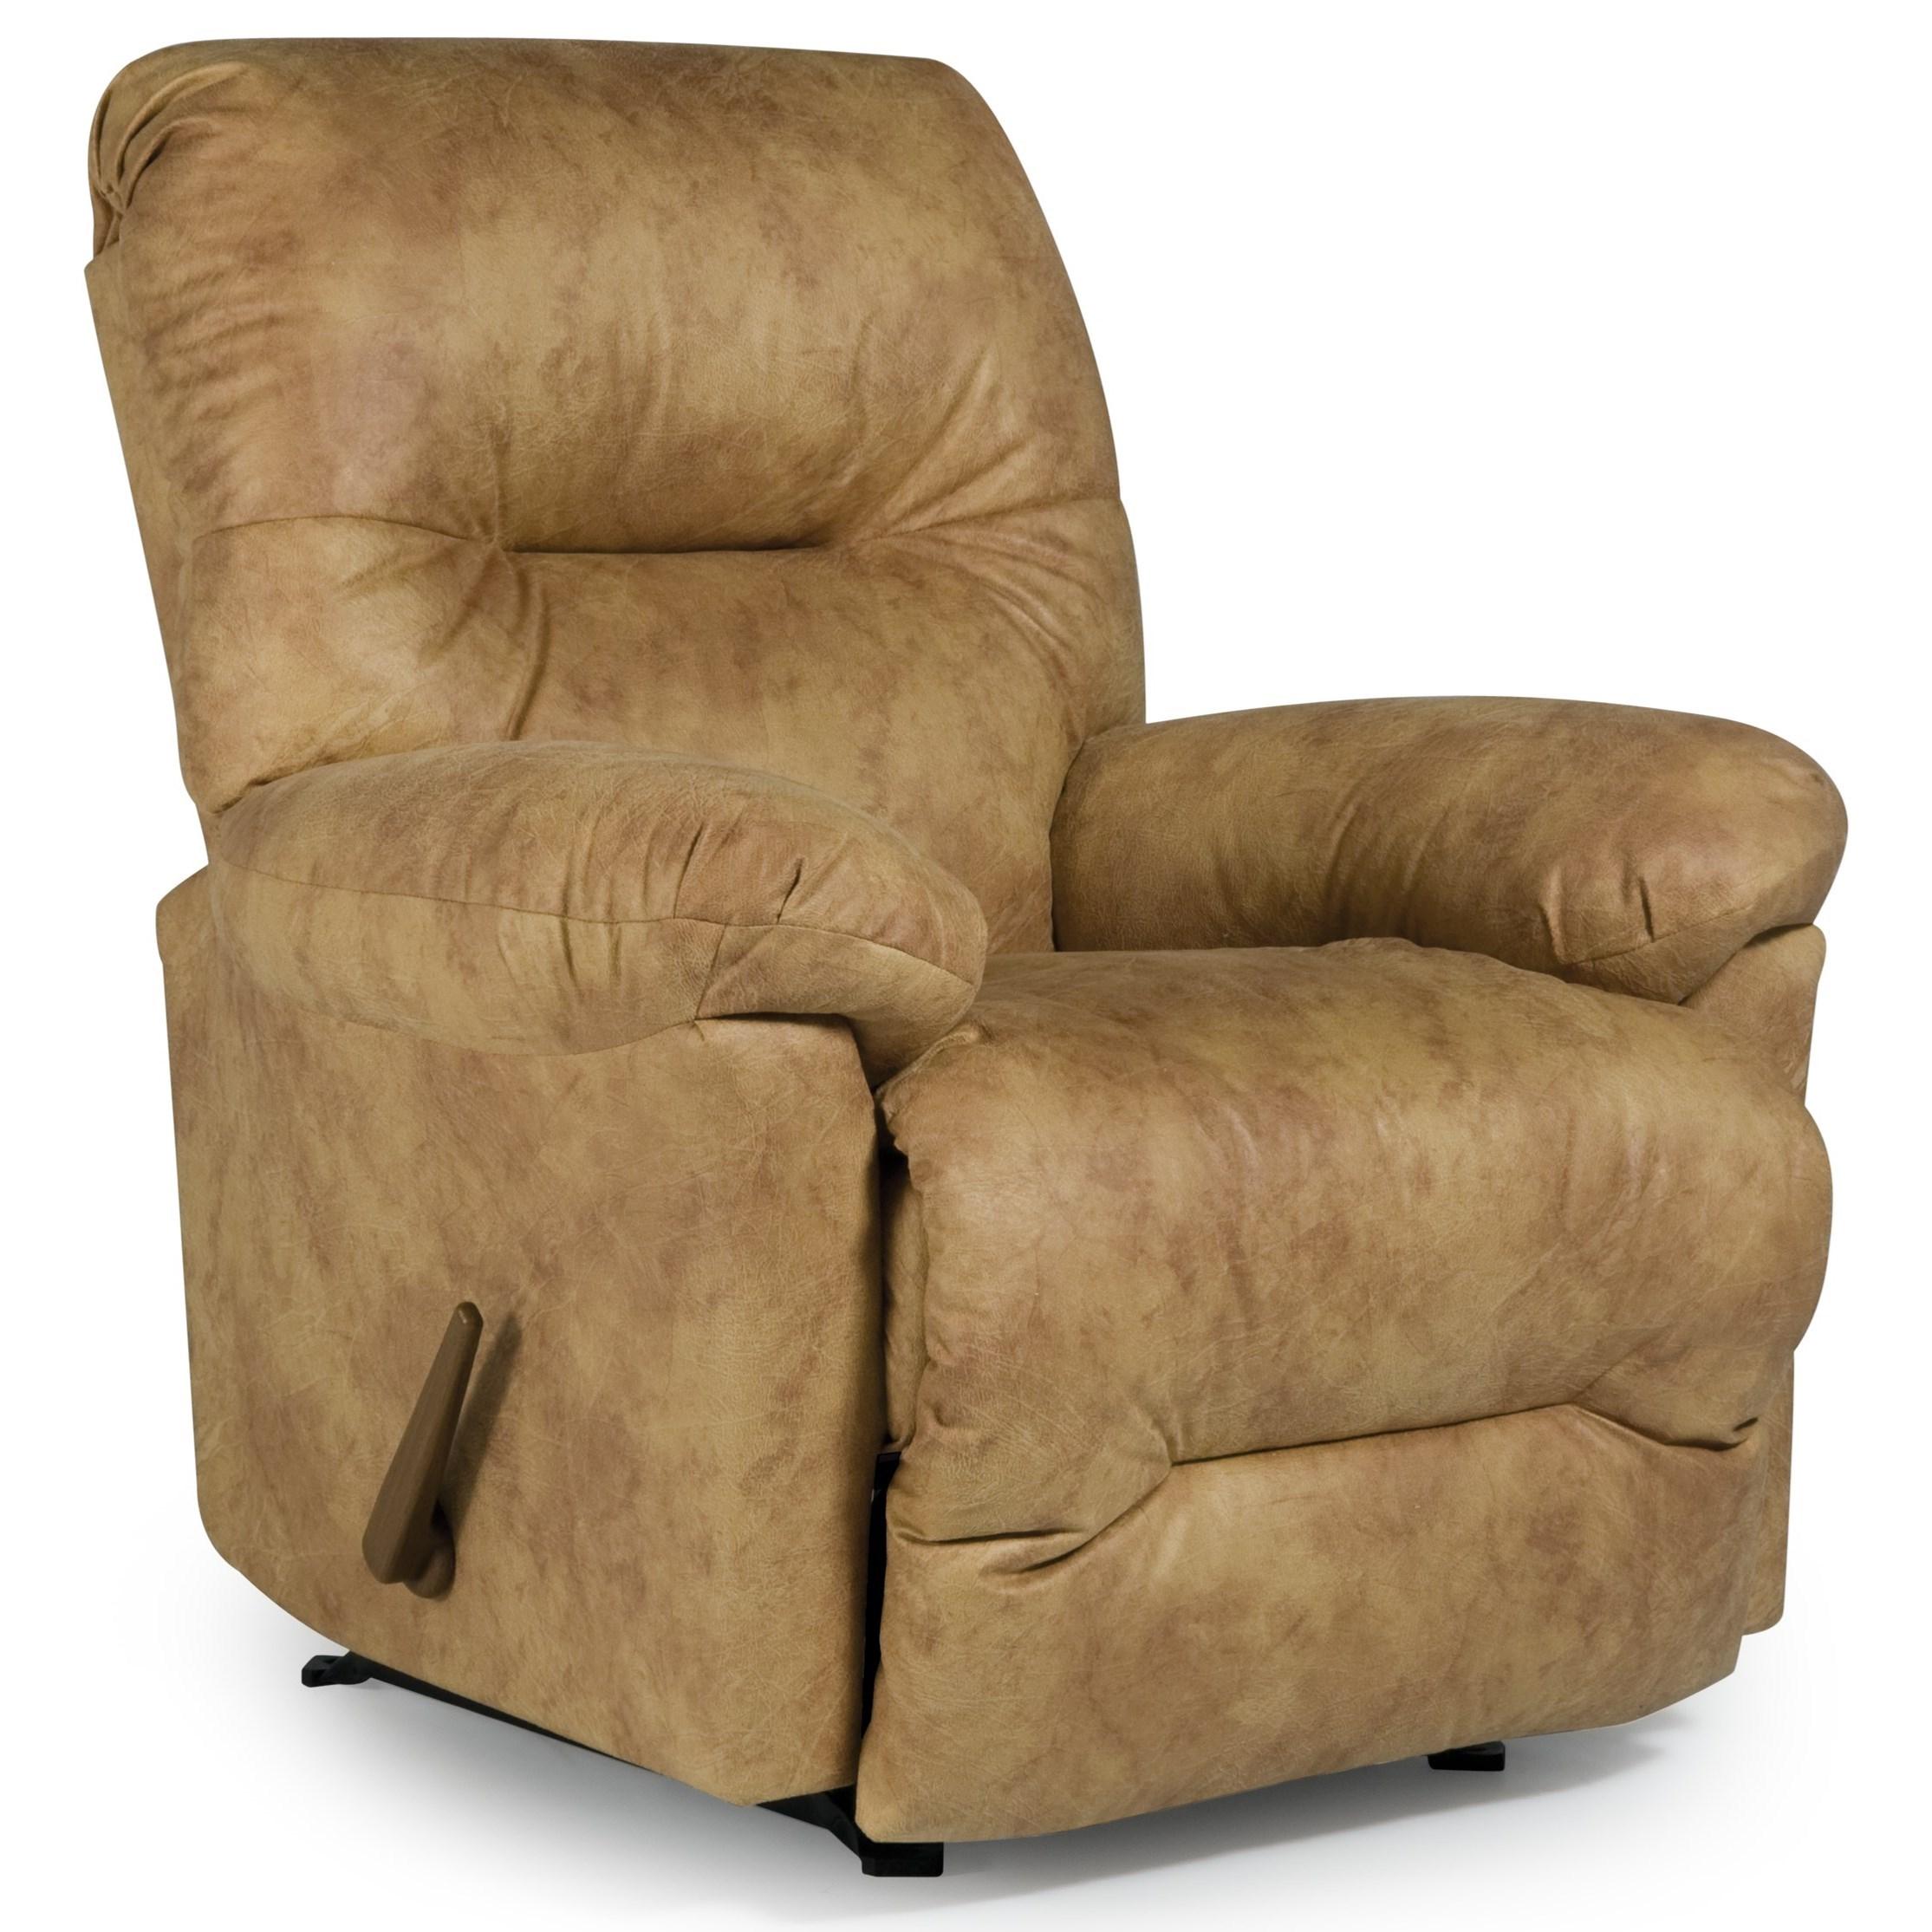 Best Home Furnishings Recliners Medium 6n25 Rodney